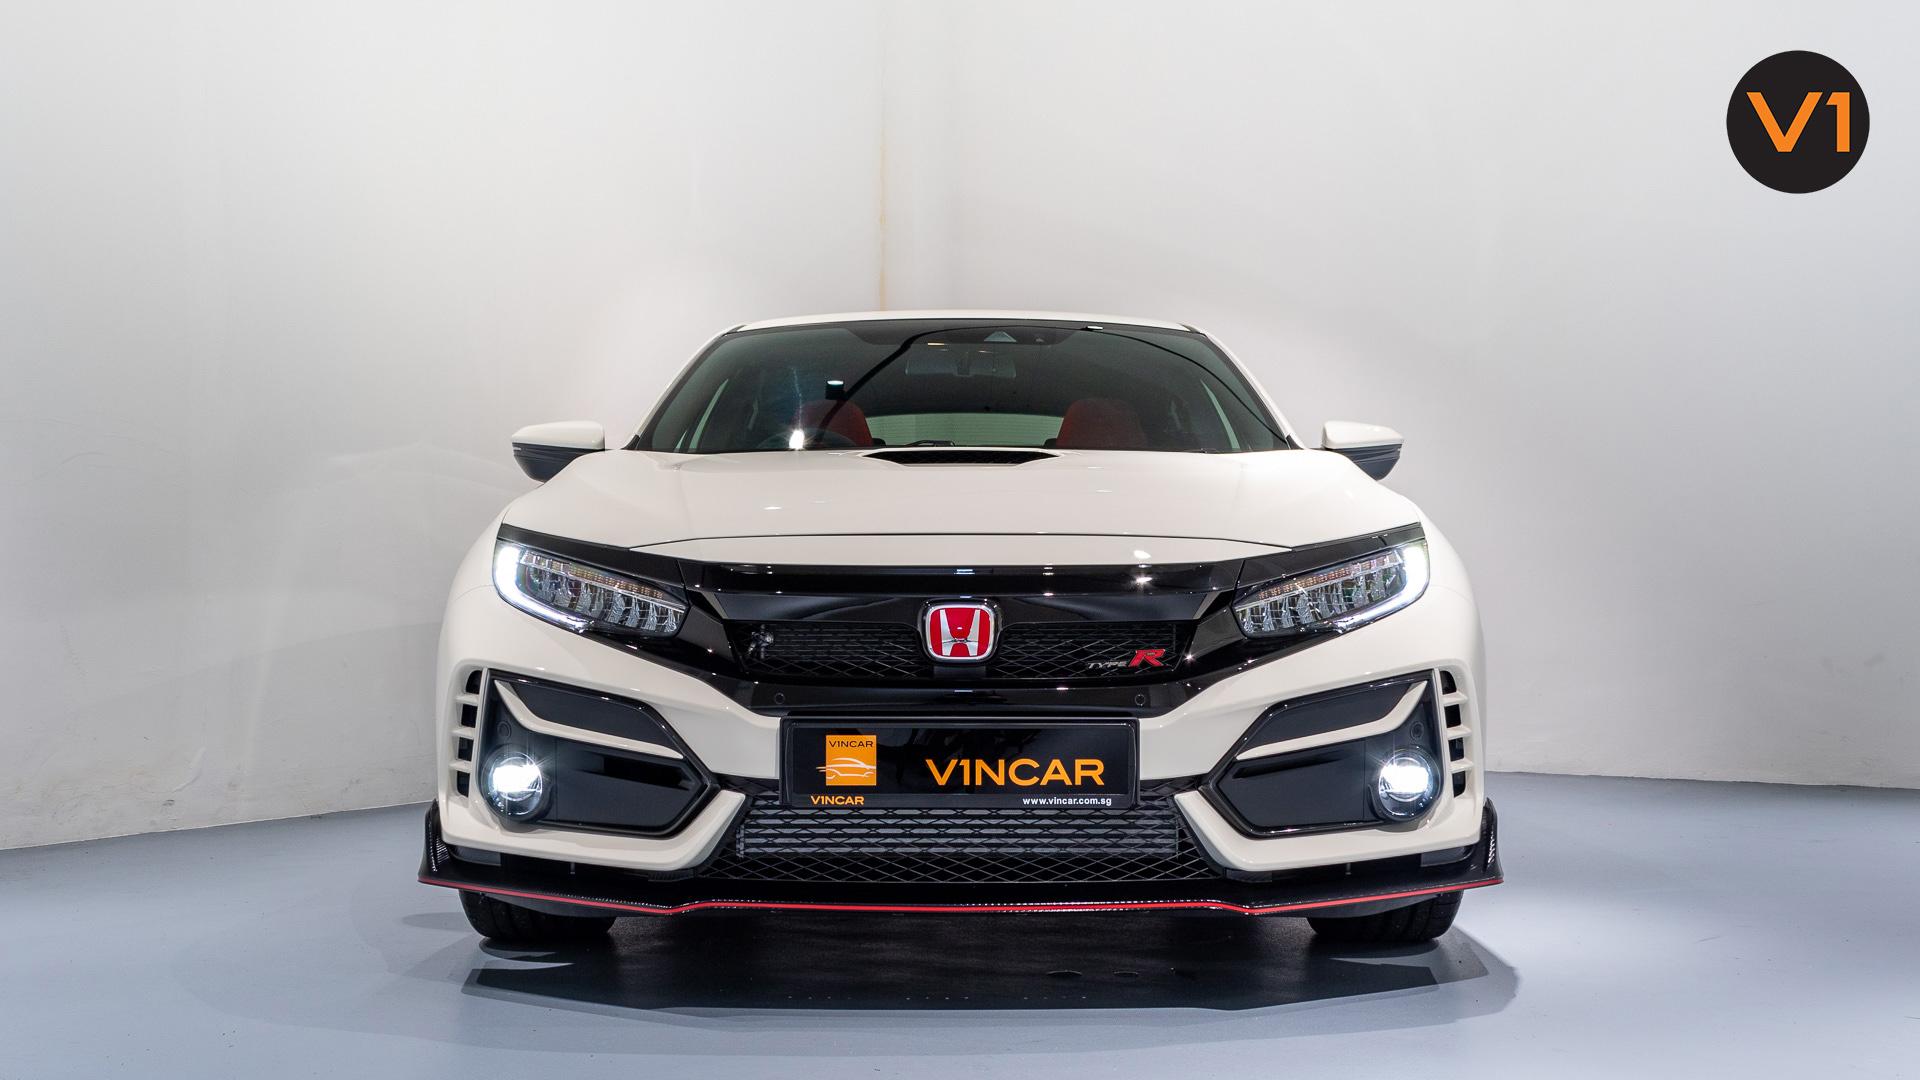 Honda Civic 2.0 Type R GT (FL2020) - Front Direct